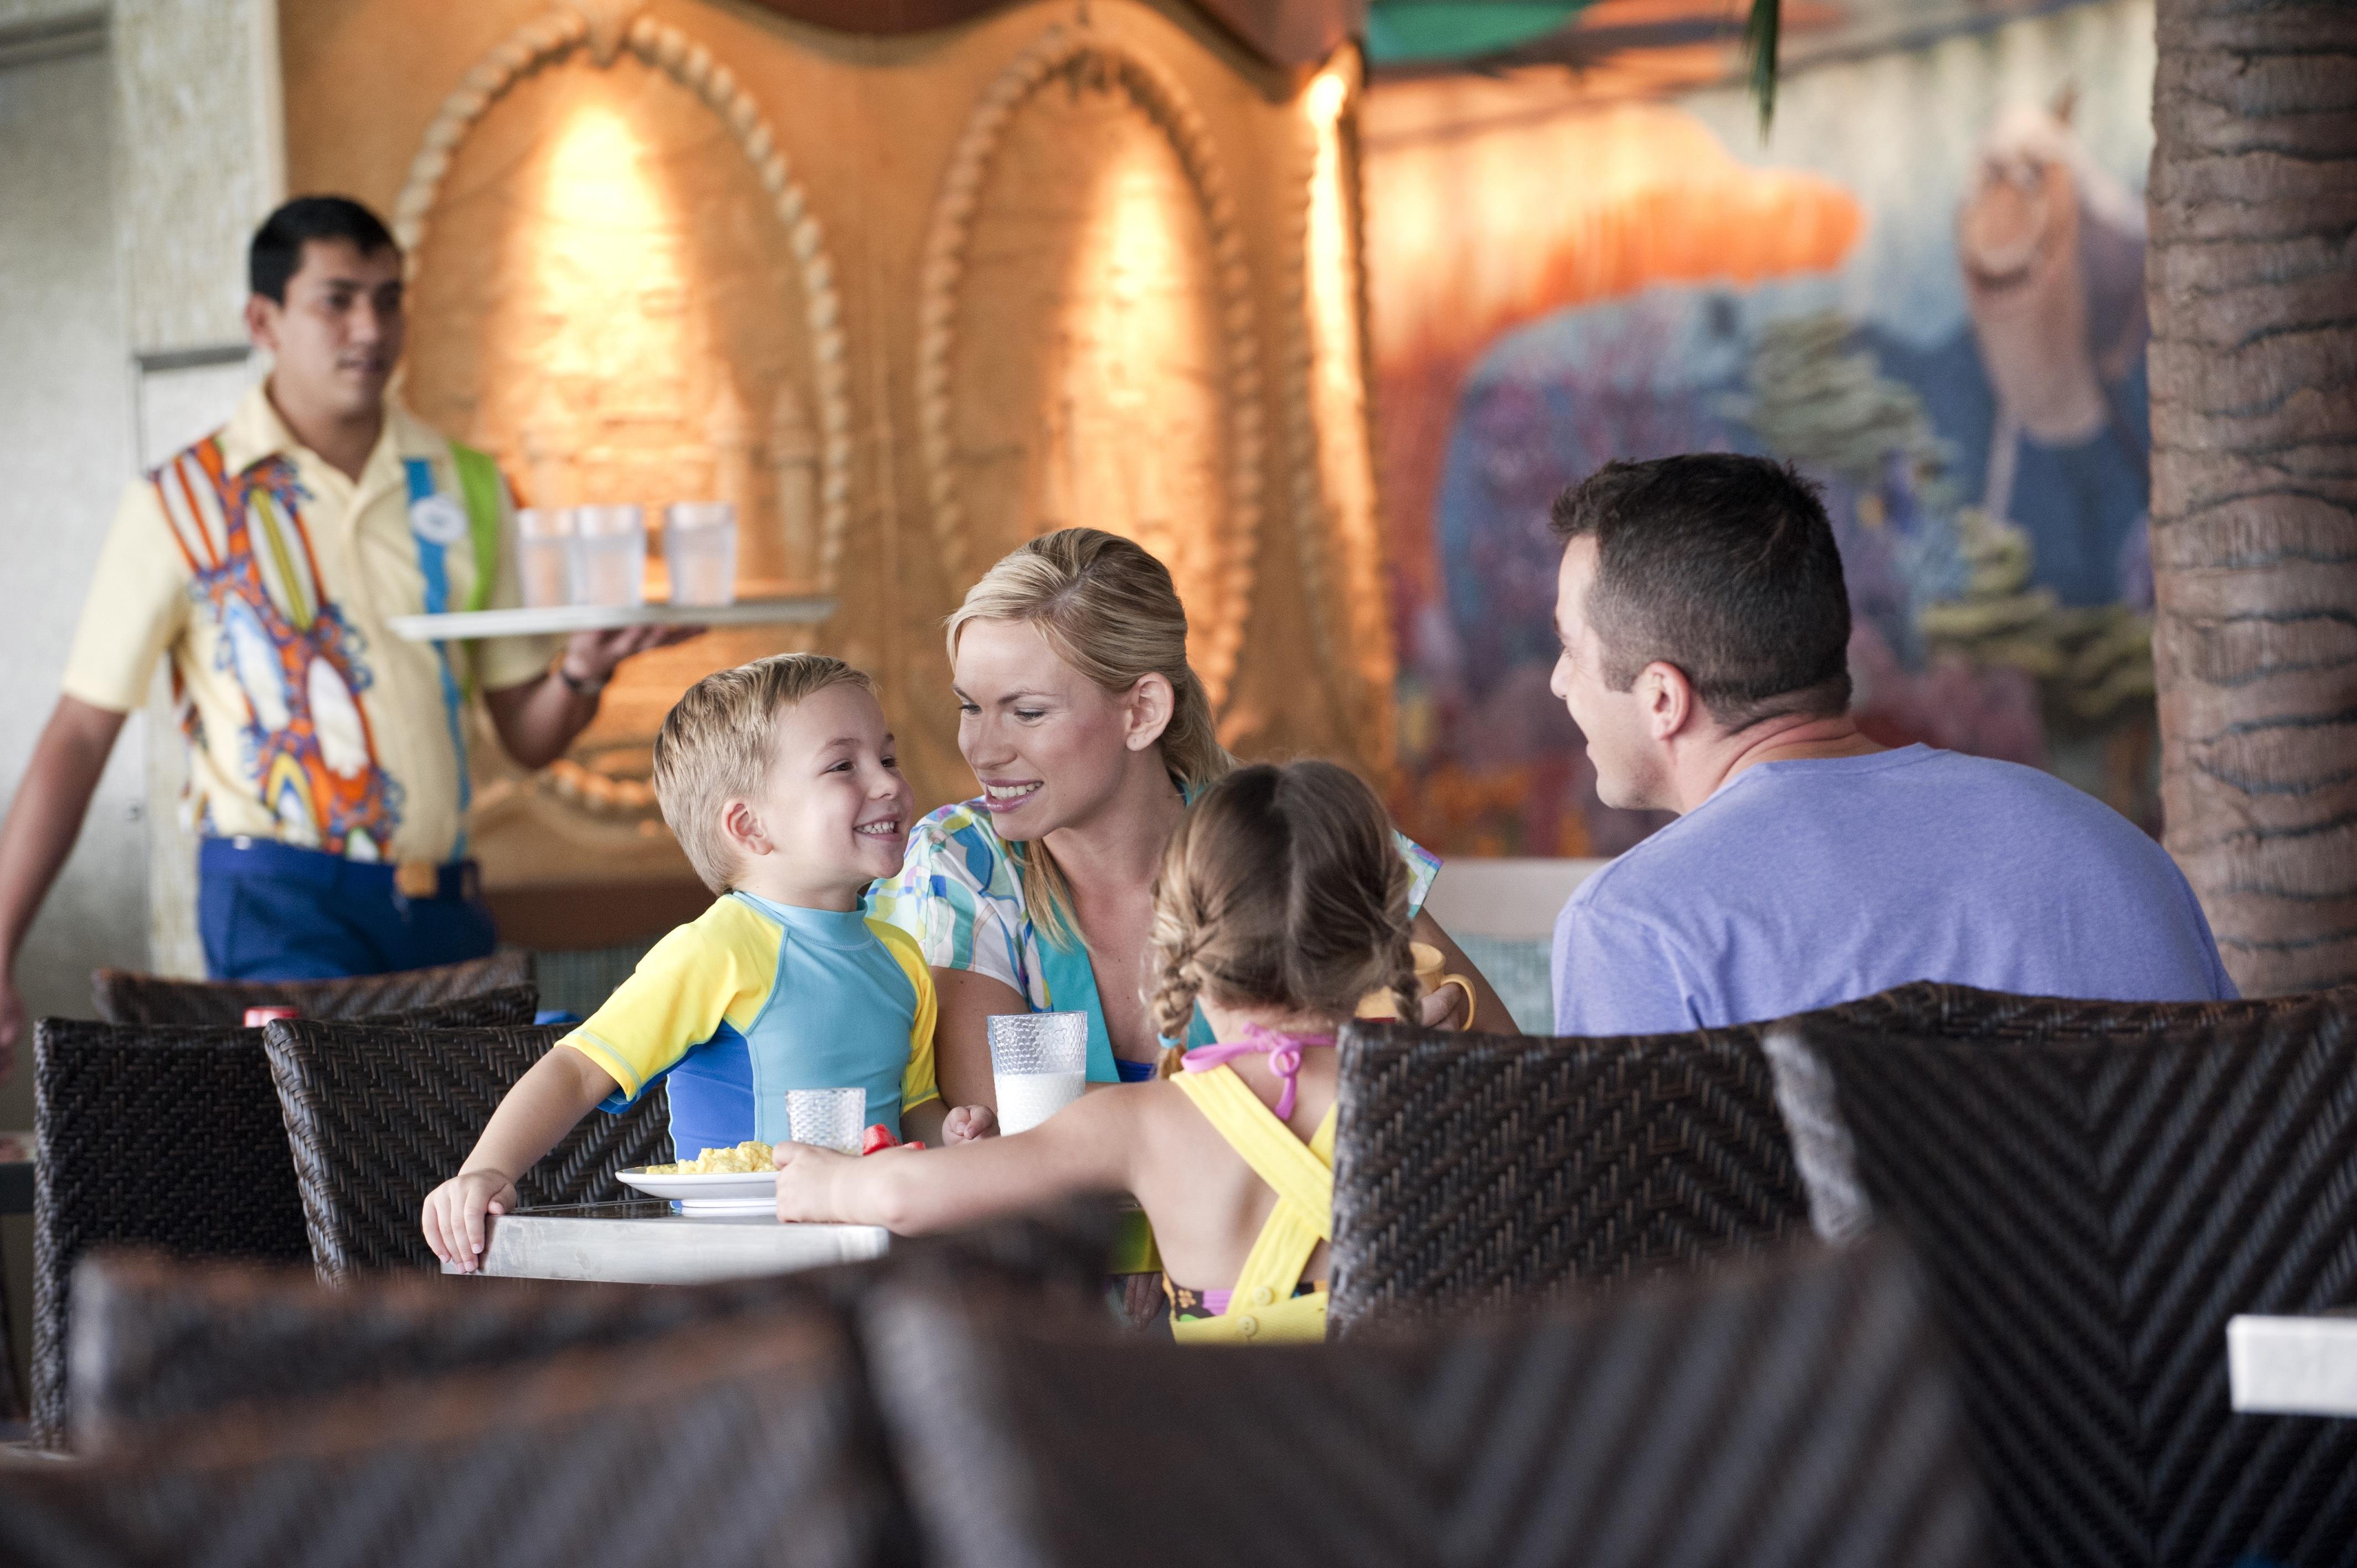 Disney Cruise Line Disney Dream Interior Cabanas Restaurant.jpg